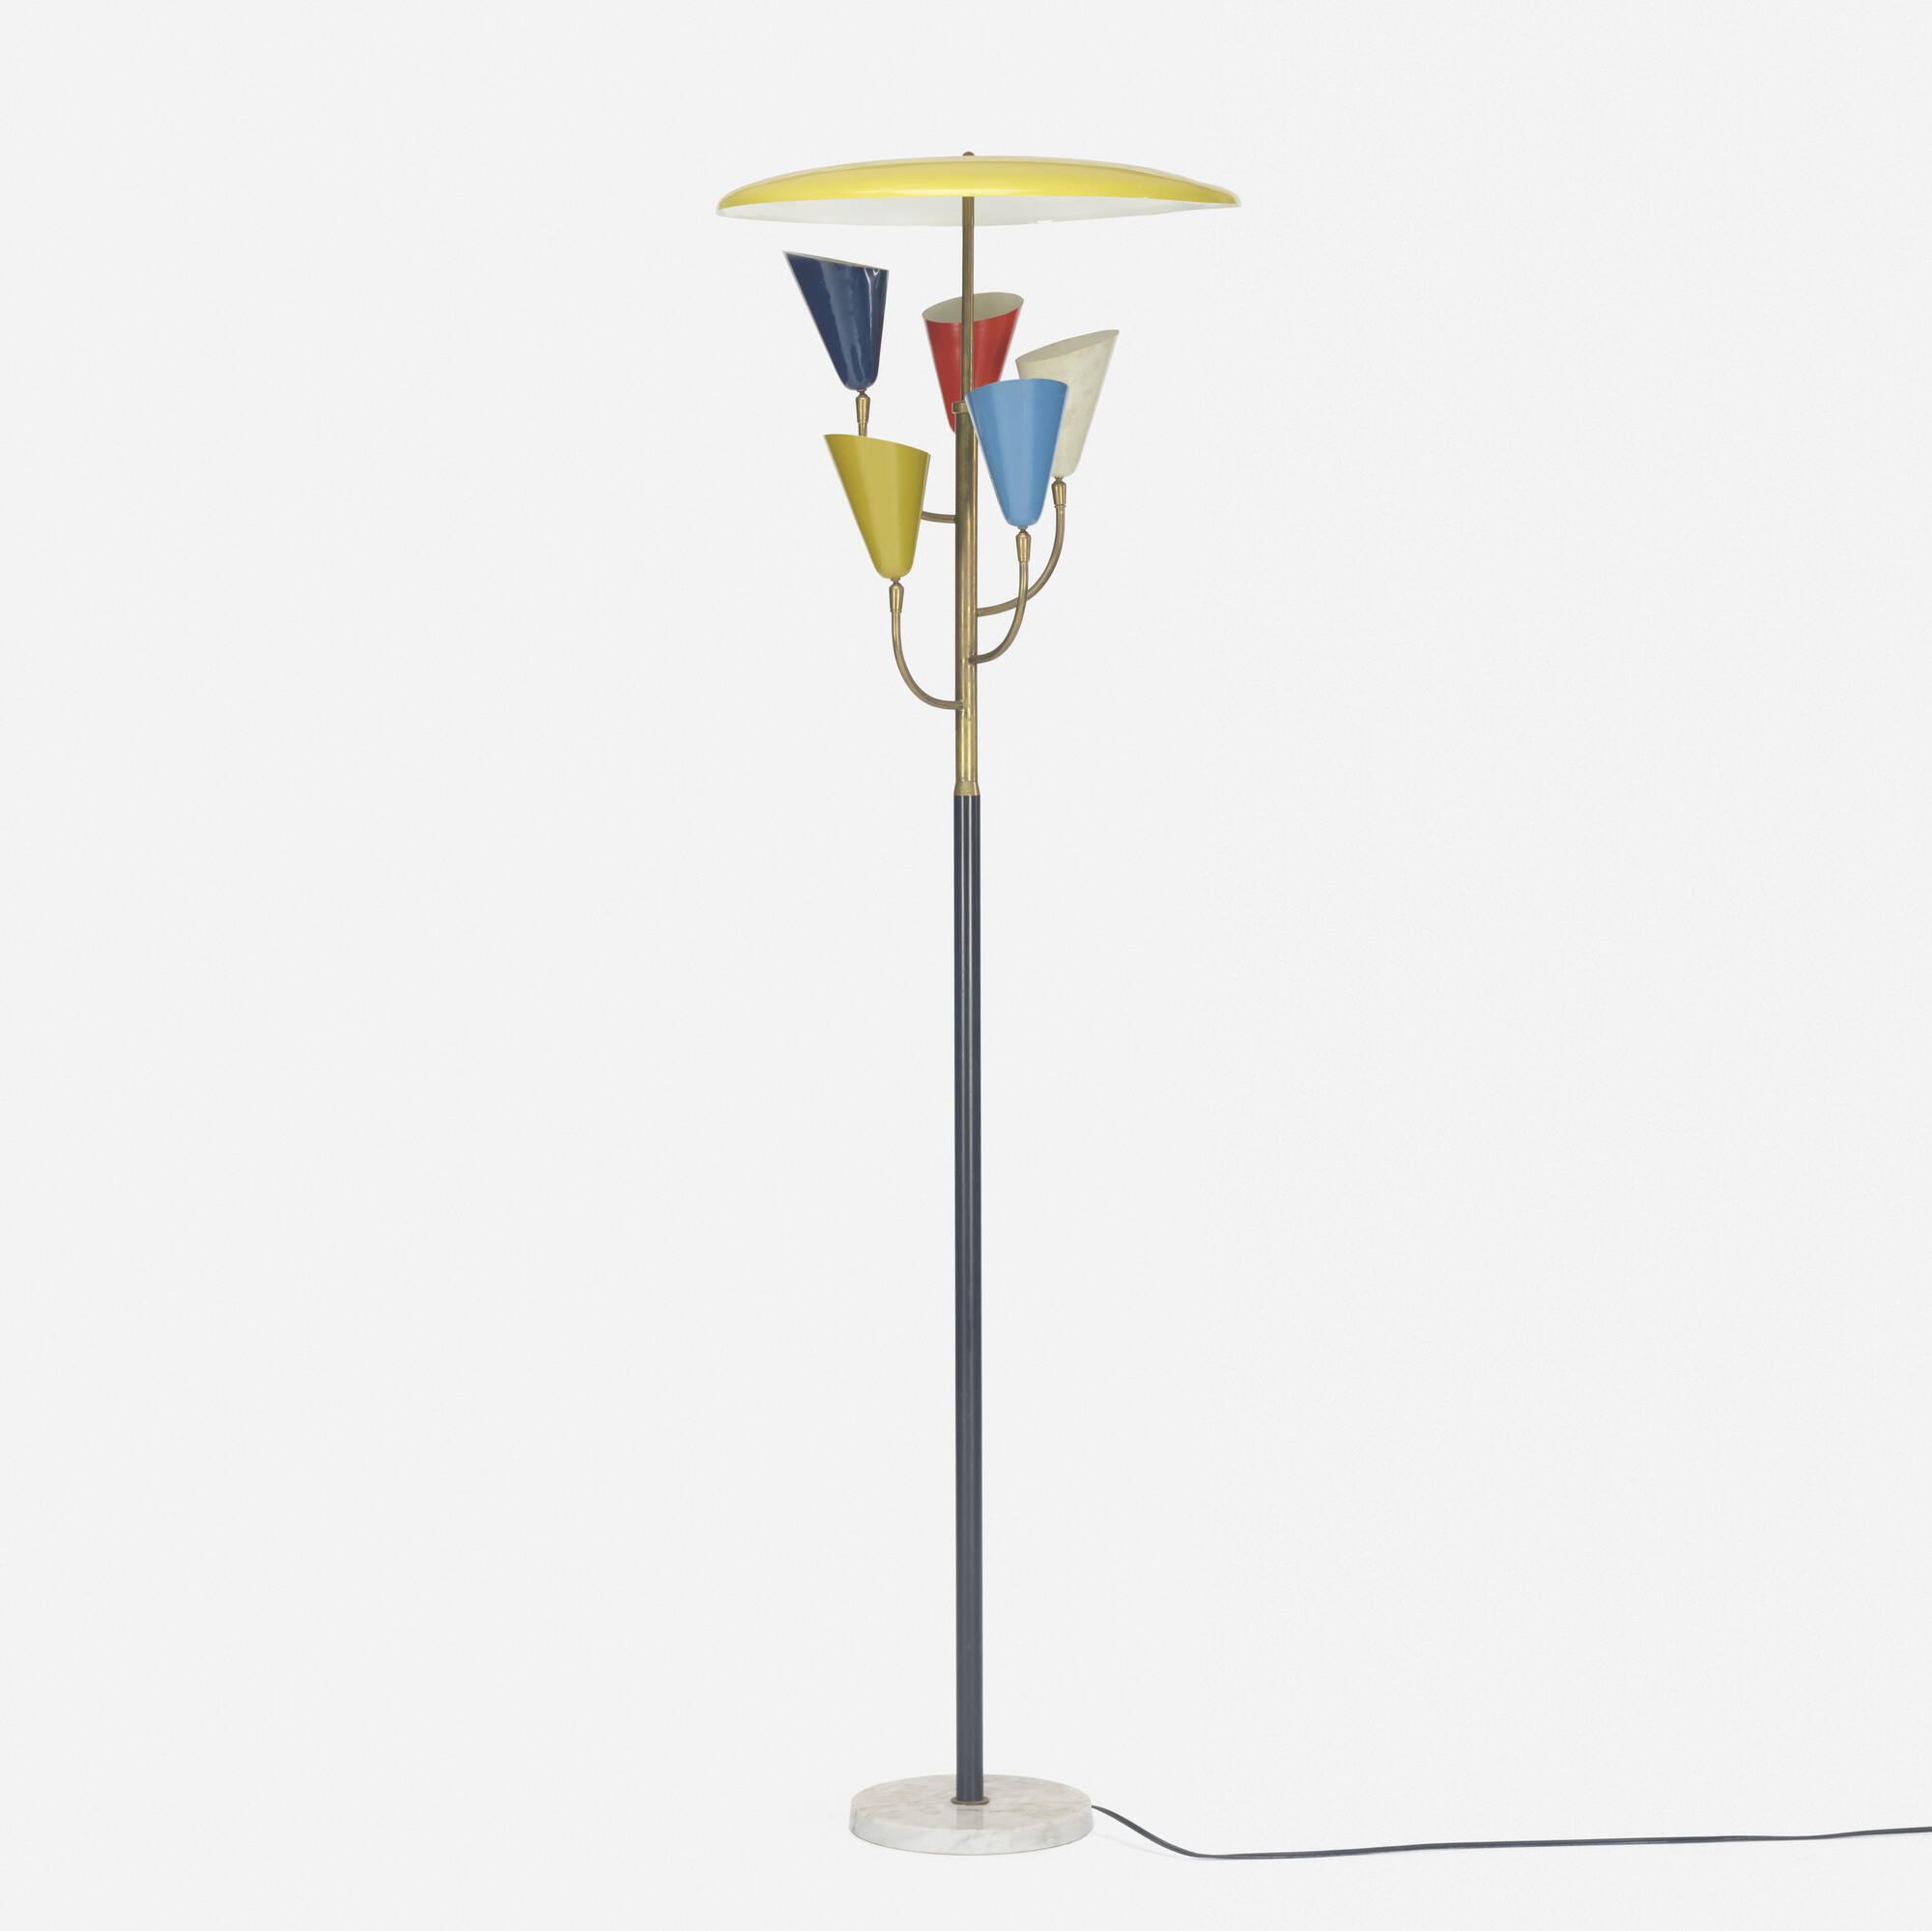 273: Italian / floor lamp (1 of 2)